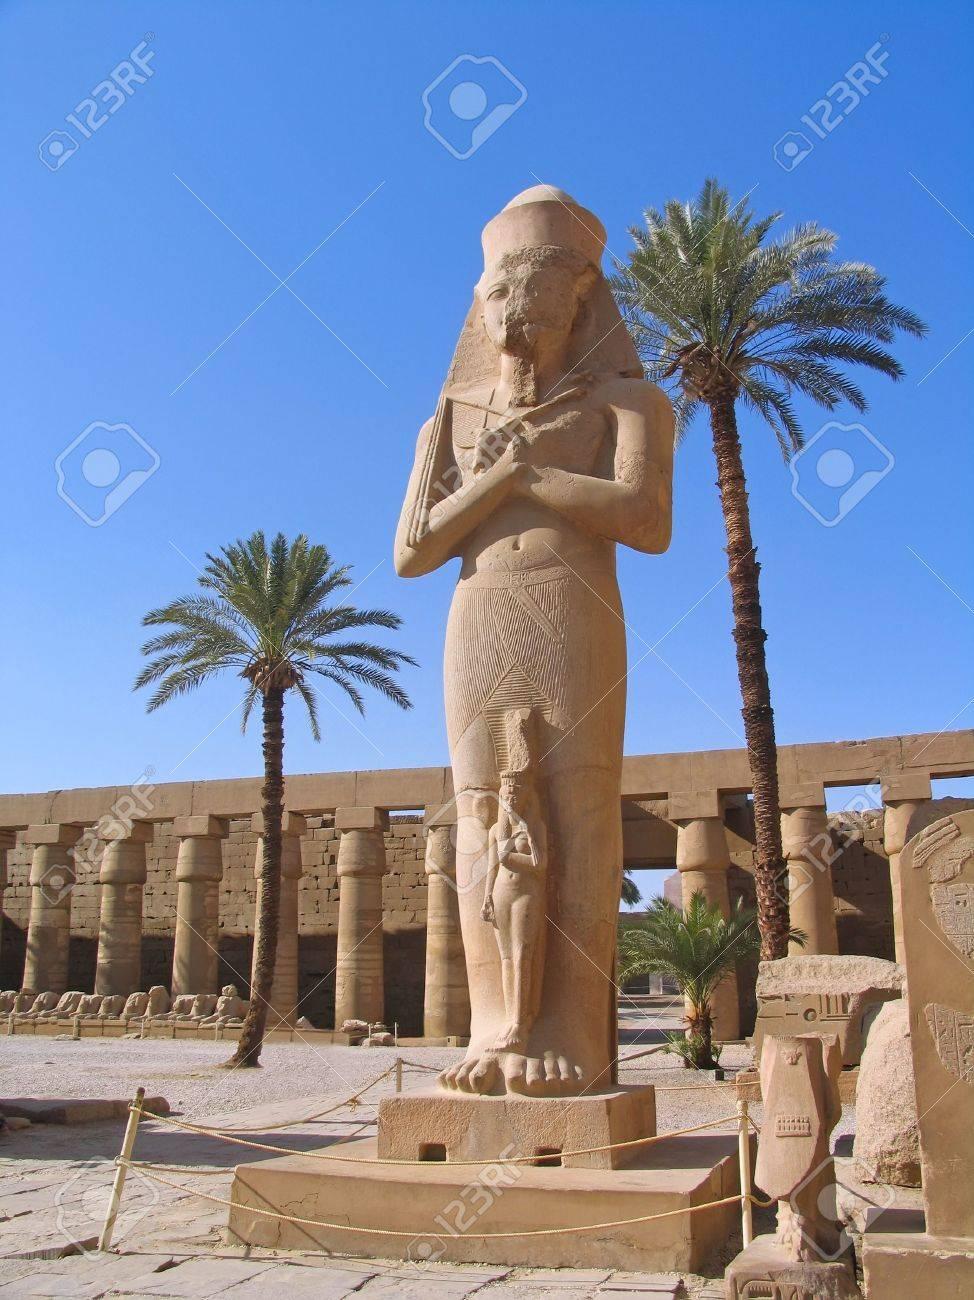 Rameses II Statue at Karnak Temple, Luxor, Egypt Stock Photo - 6824949